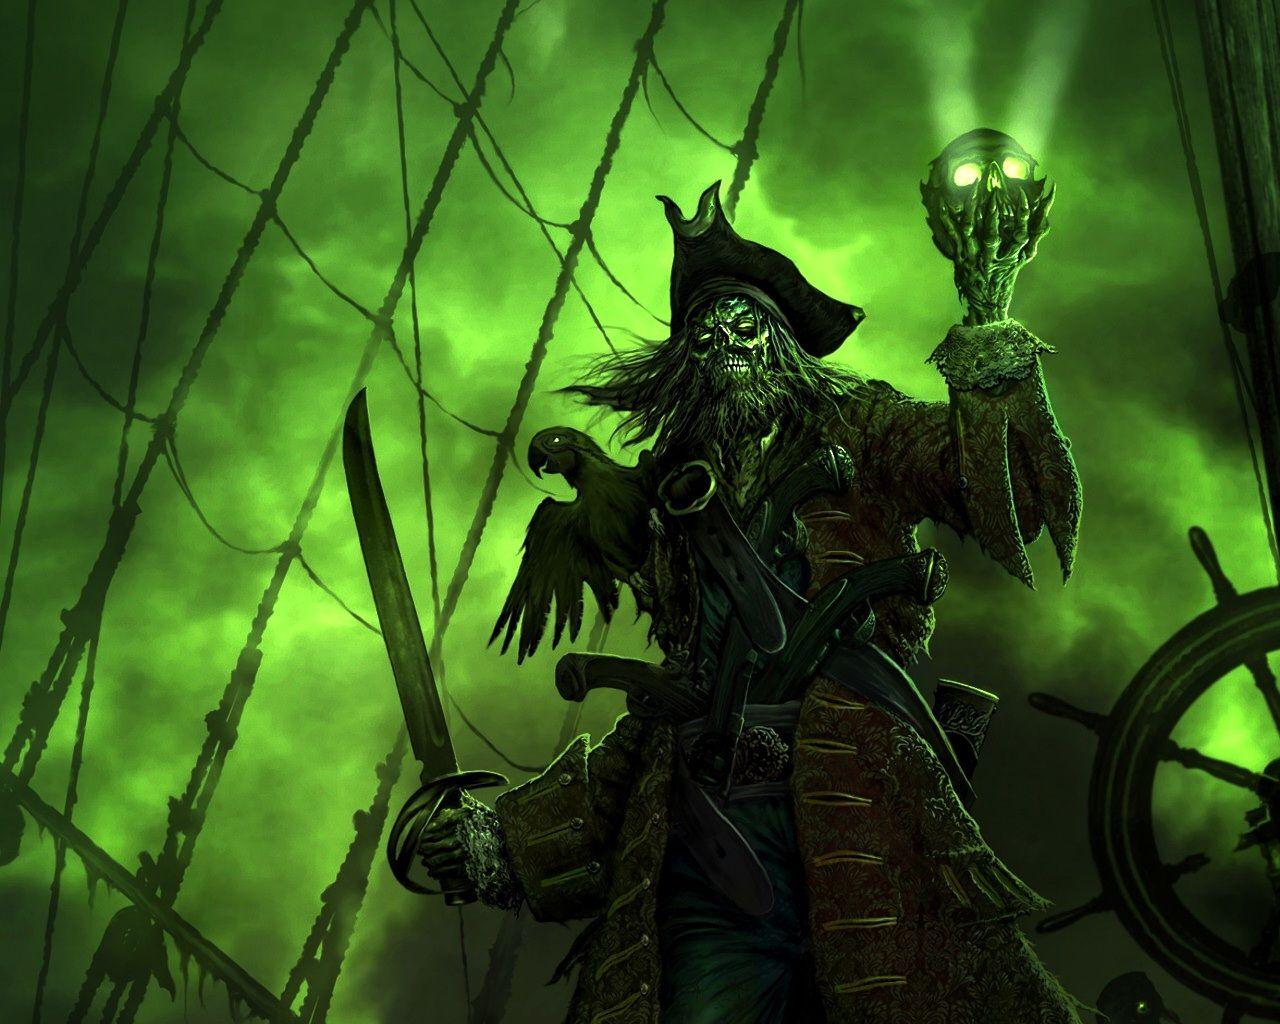 wallpapers :: green, skulls, black, pirate ship, pirates, parrots